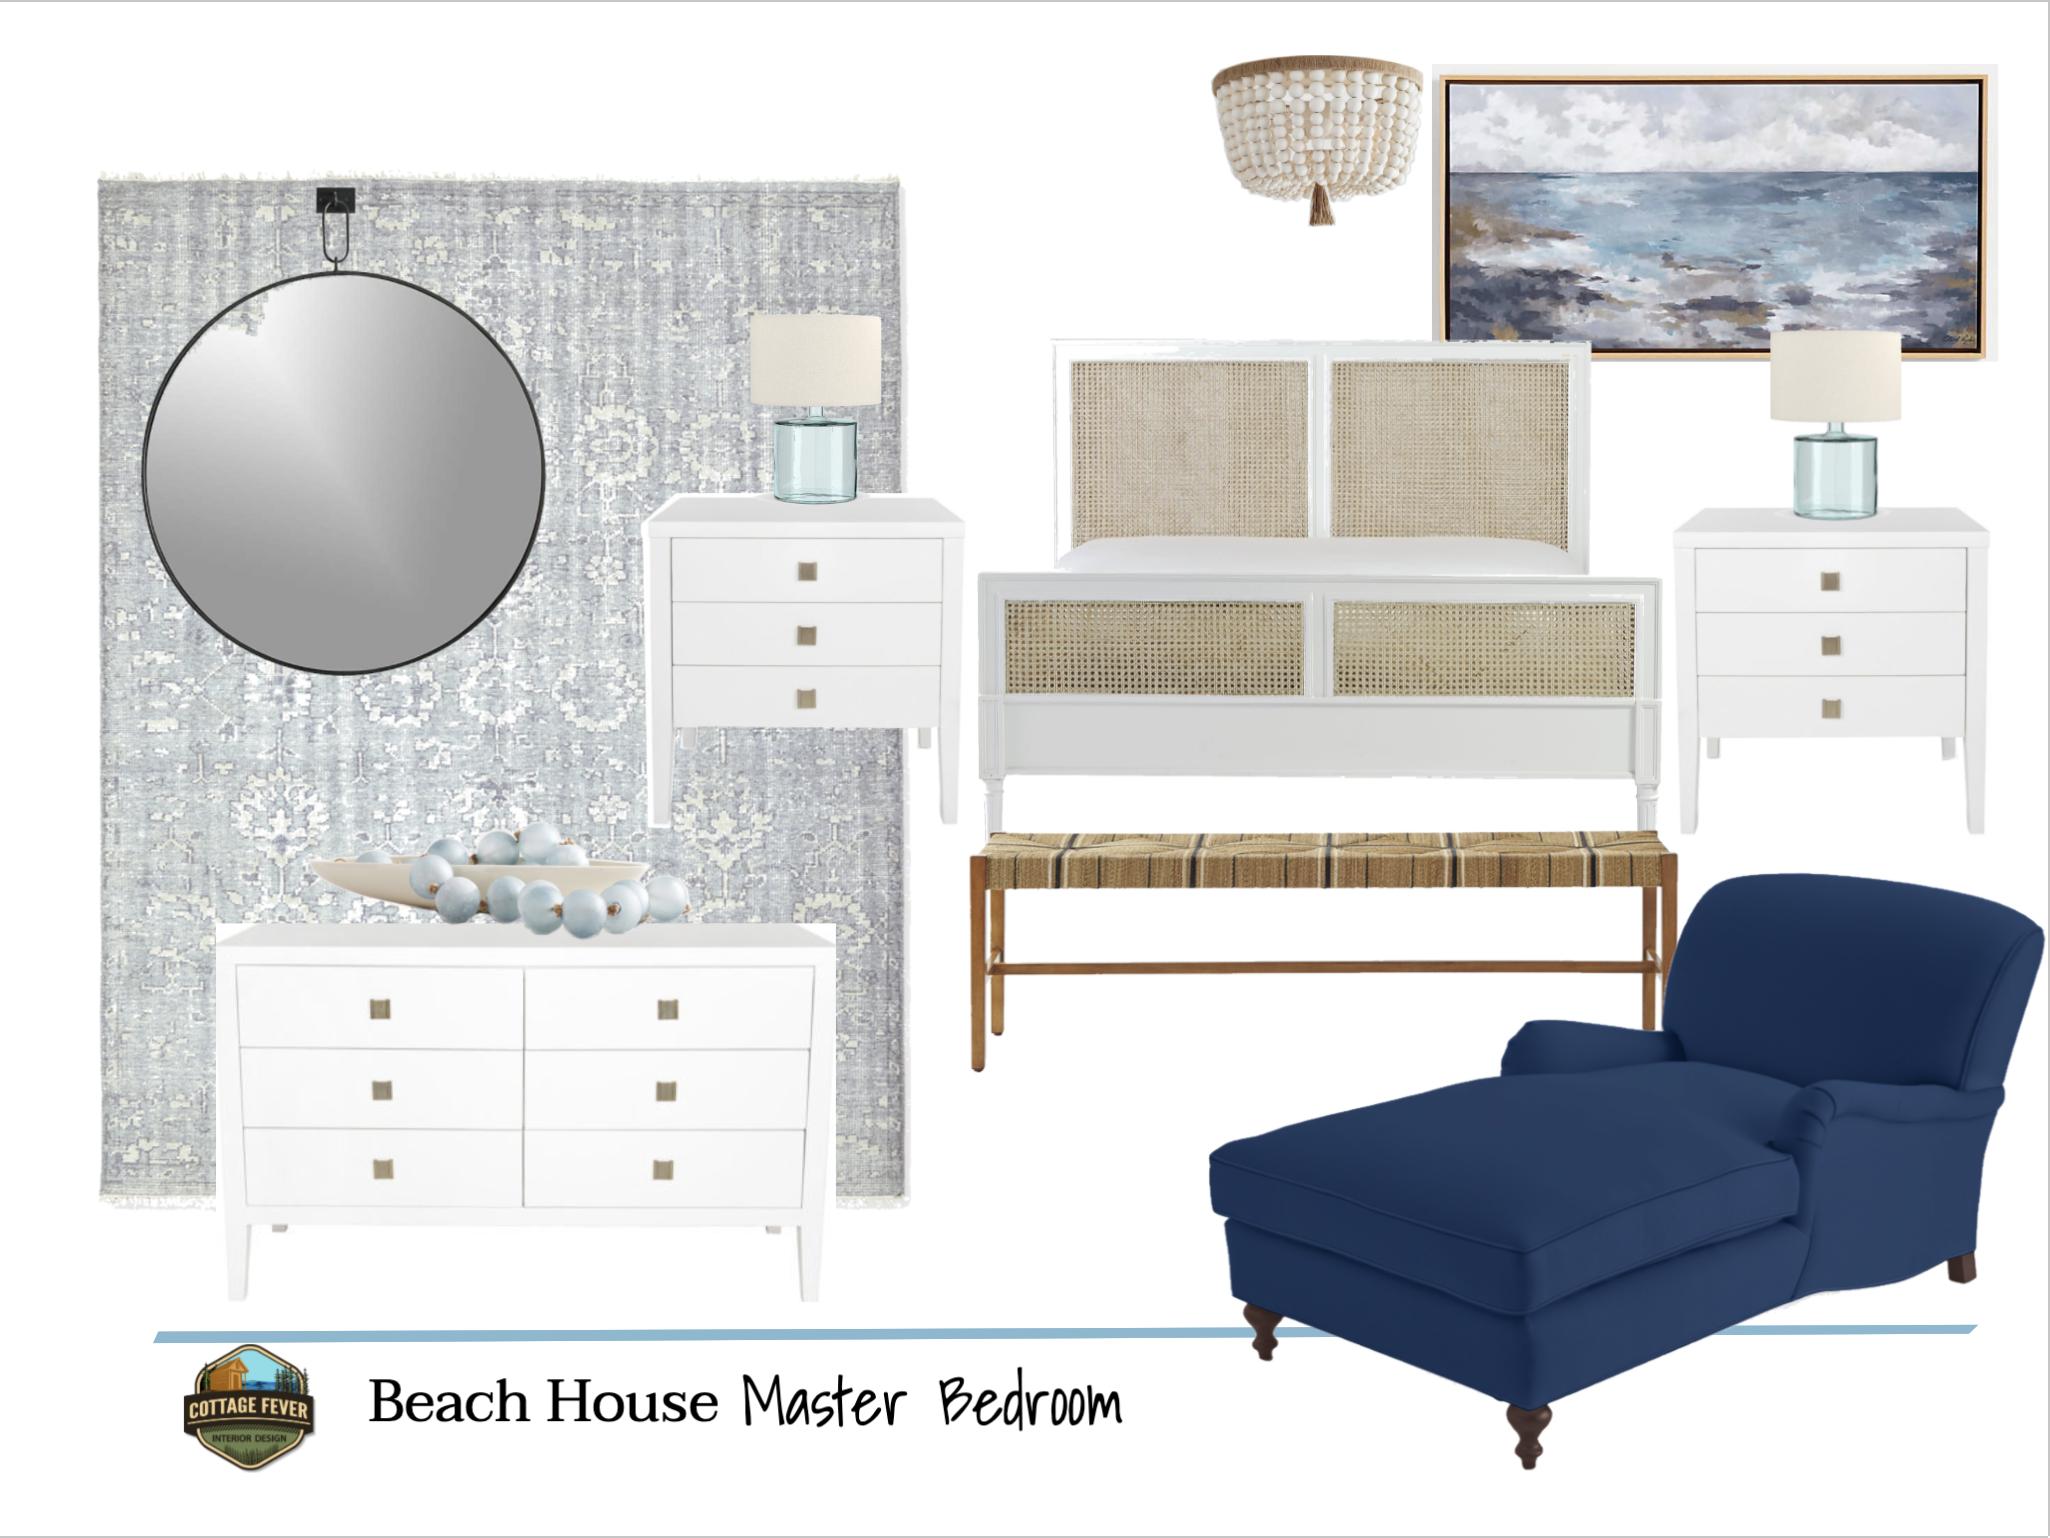 Designing a Coastal Master Bedroom